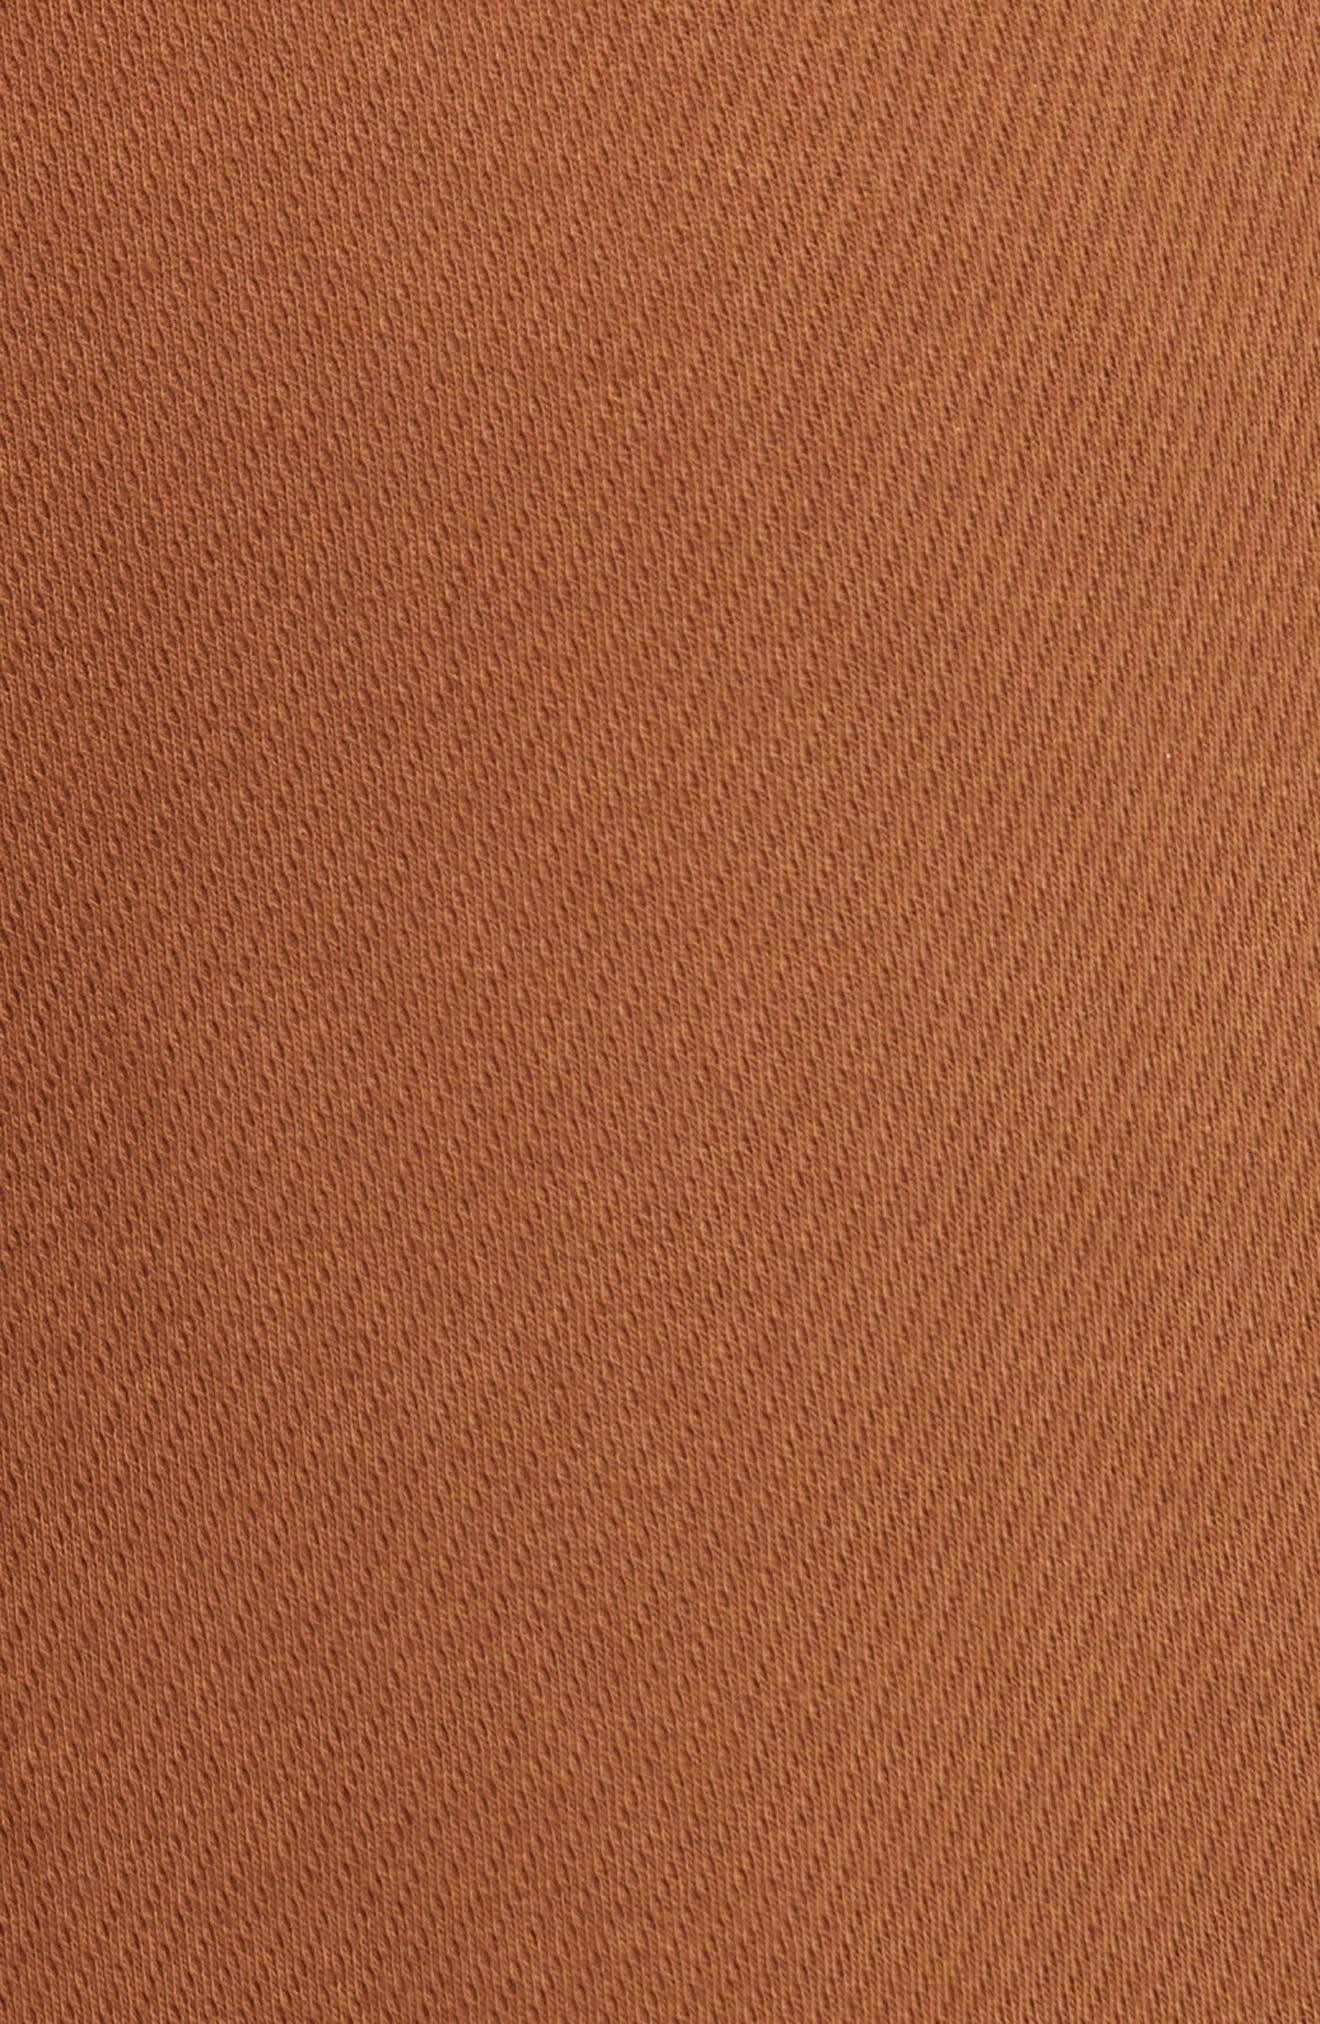 Strangelove Flare Sweatpants,                             Alternate thumbnail 6, color,                             200